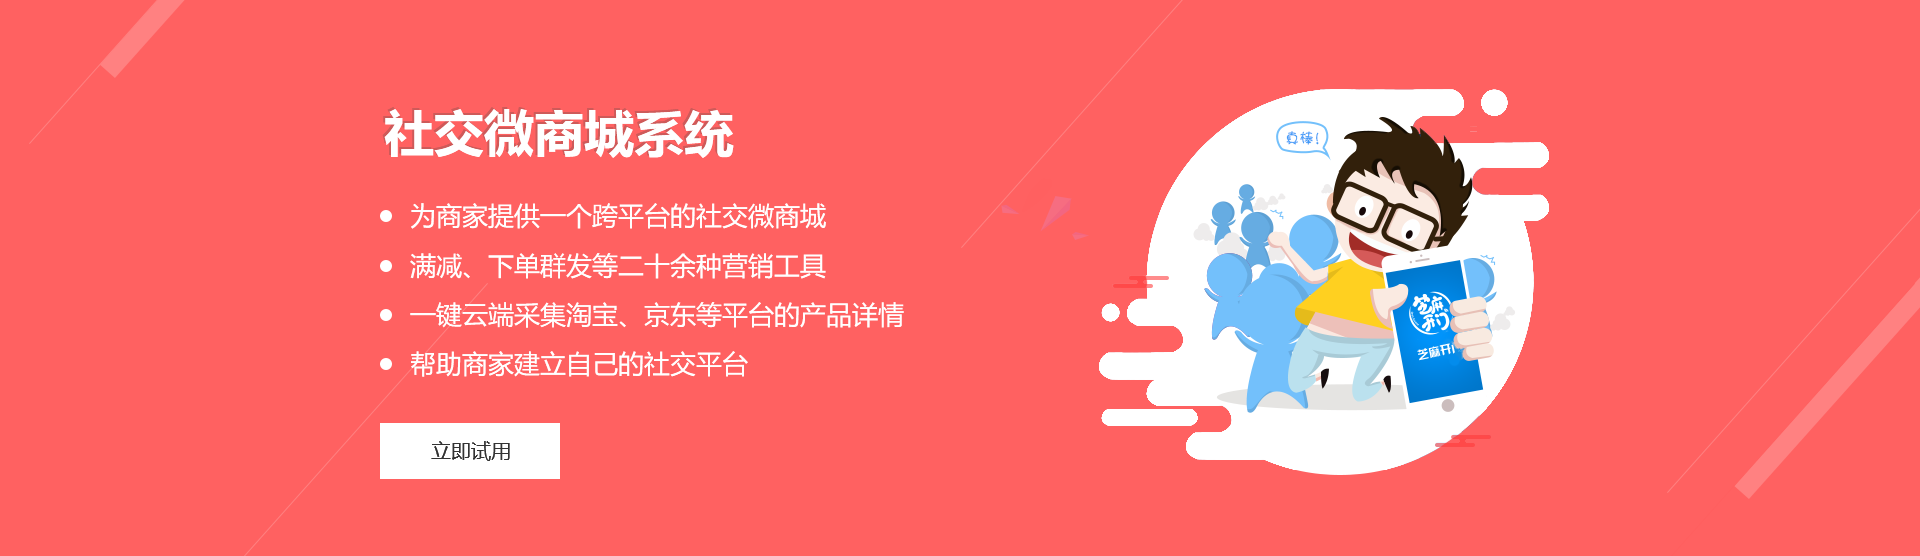 店易加社交微商城系统banner